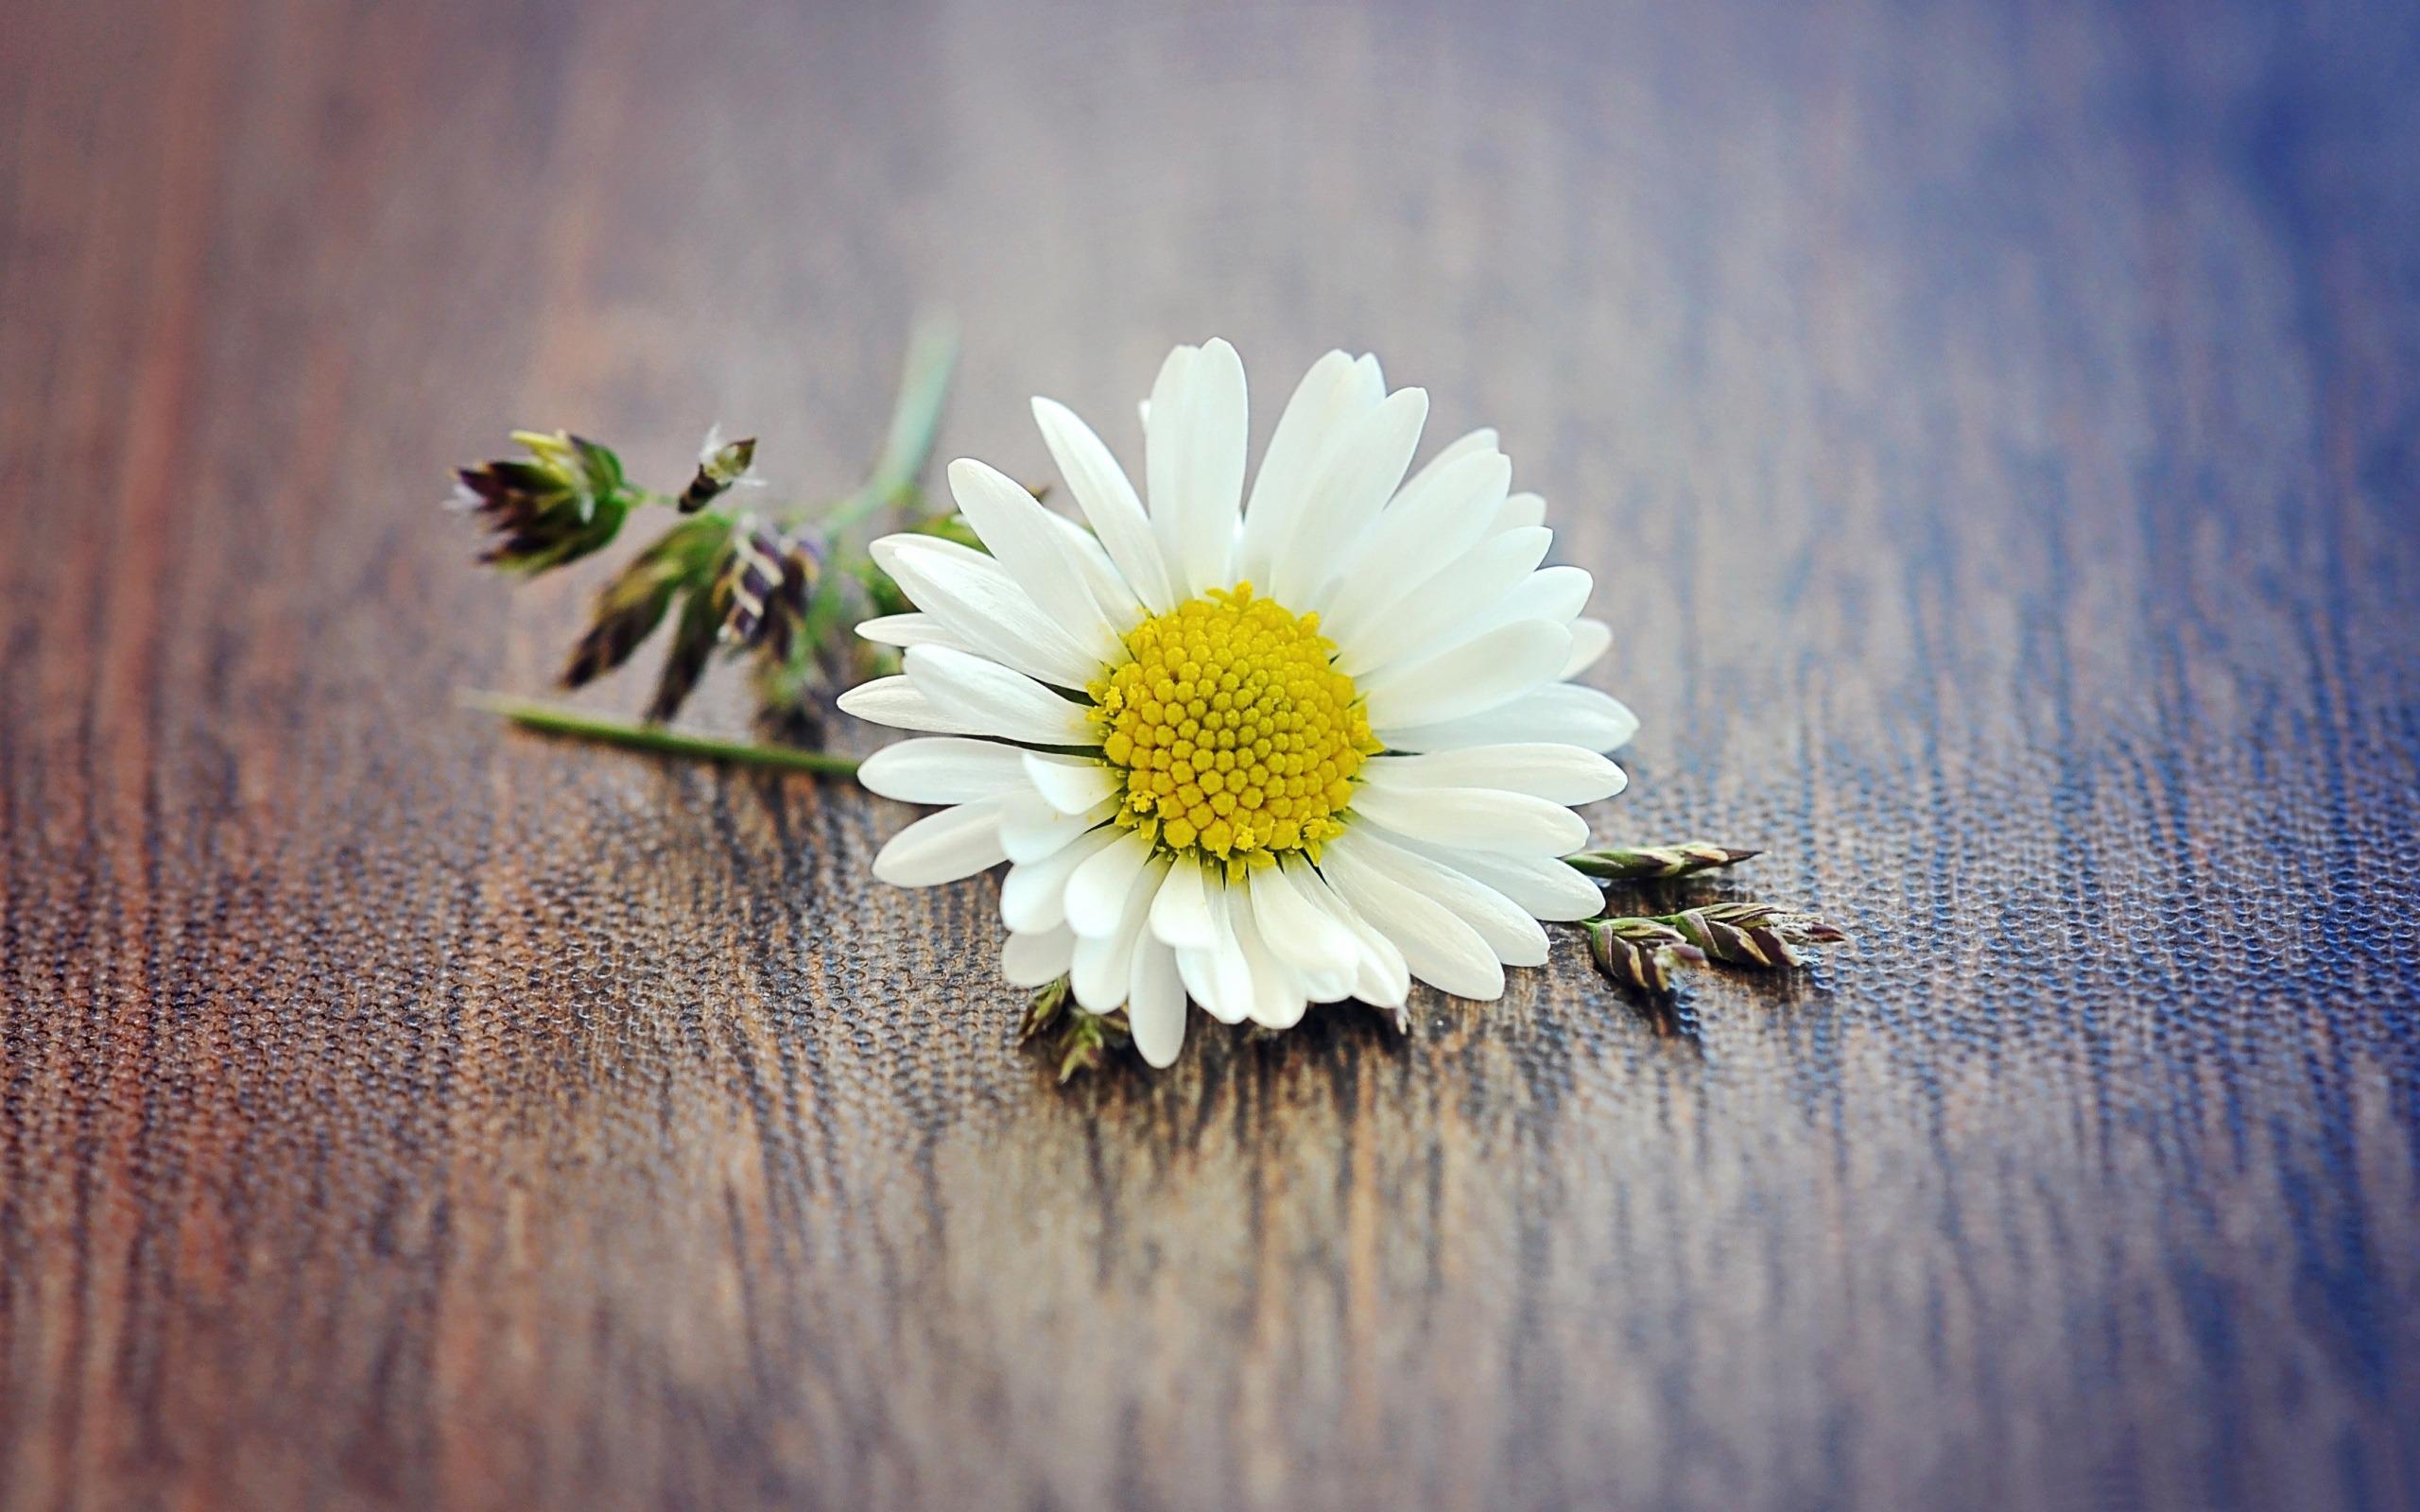 flower yellow grass white daisy still lifespring nature